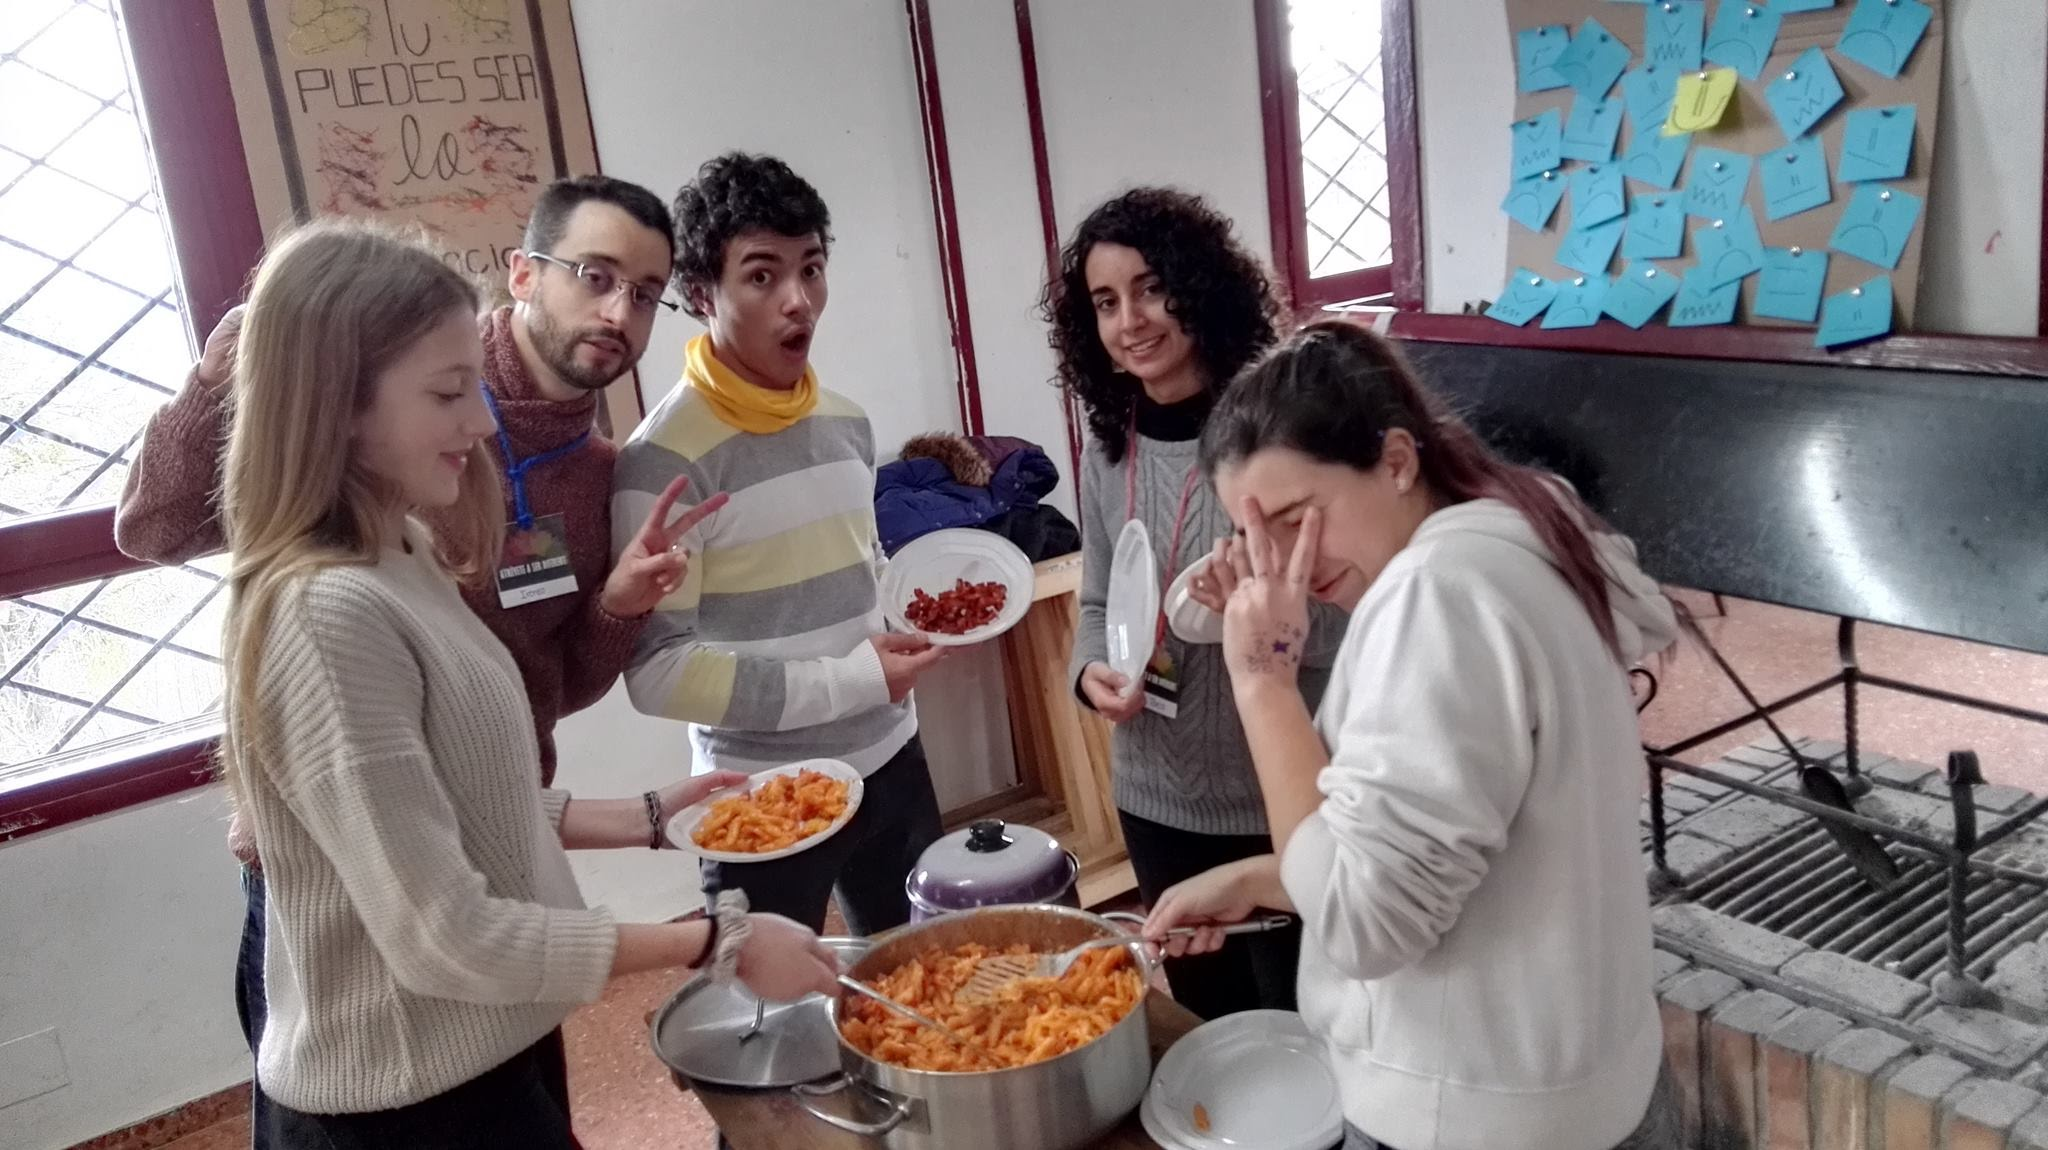 2017.02.17y18 - Desafió ATREVETE A SER DIFERENTE (12).jpg